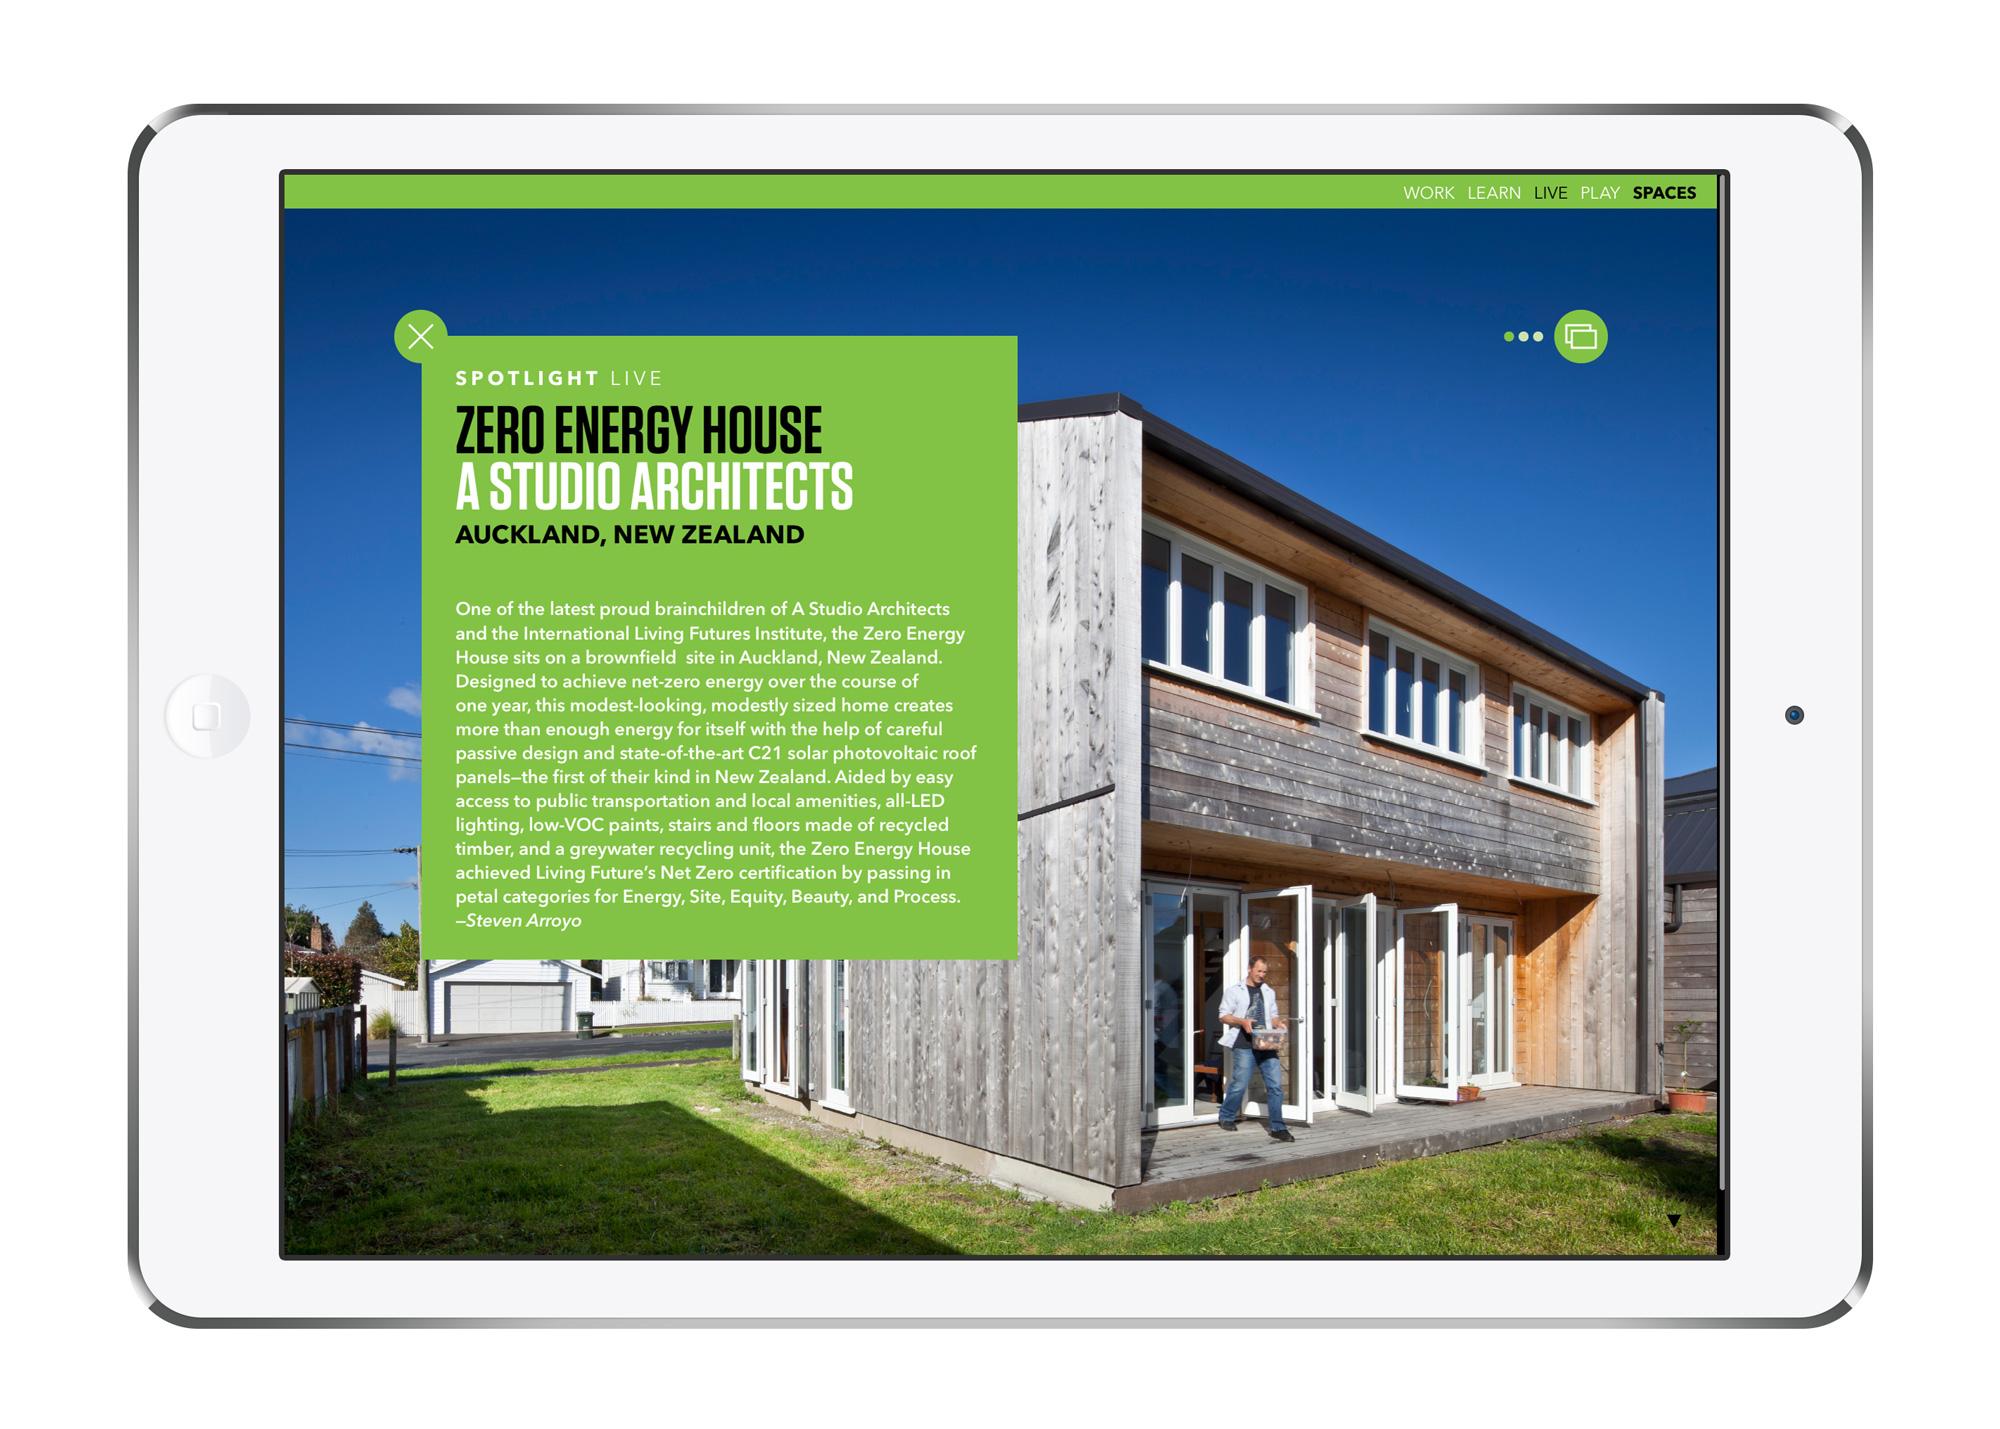 GBD_iPad_Project-Spotlight.jpg